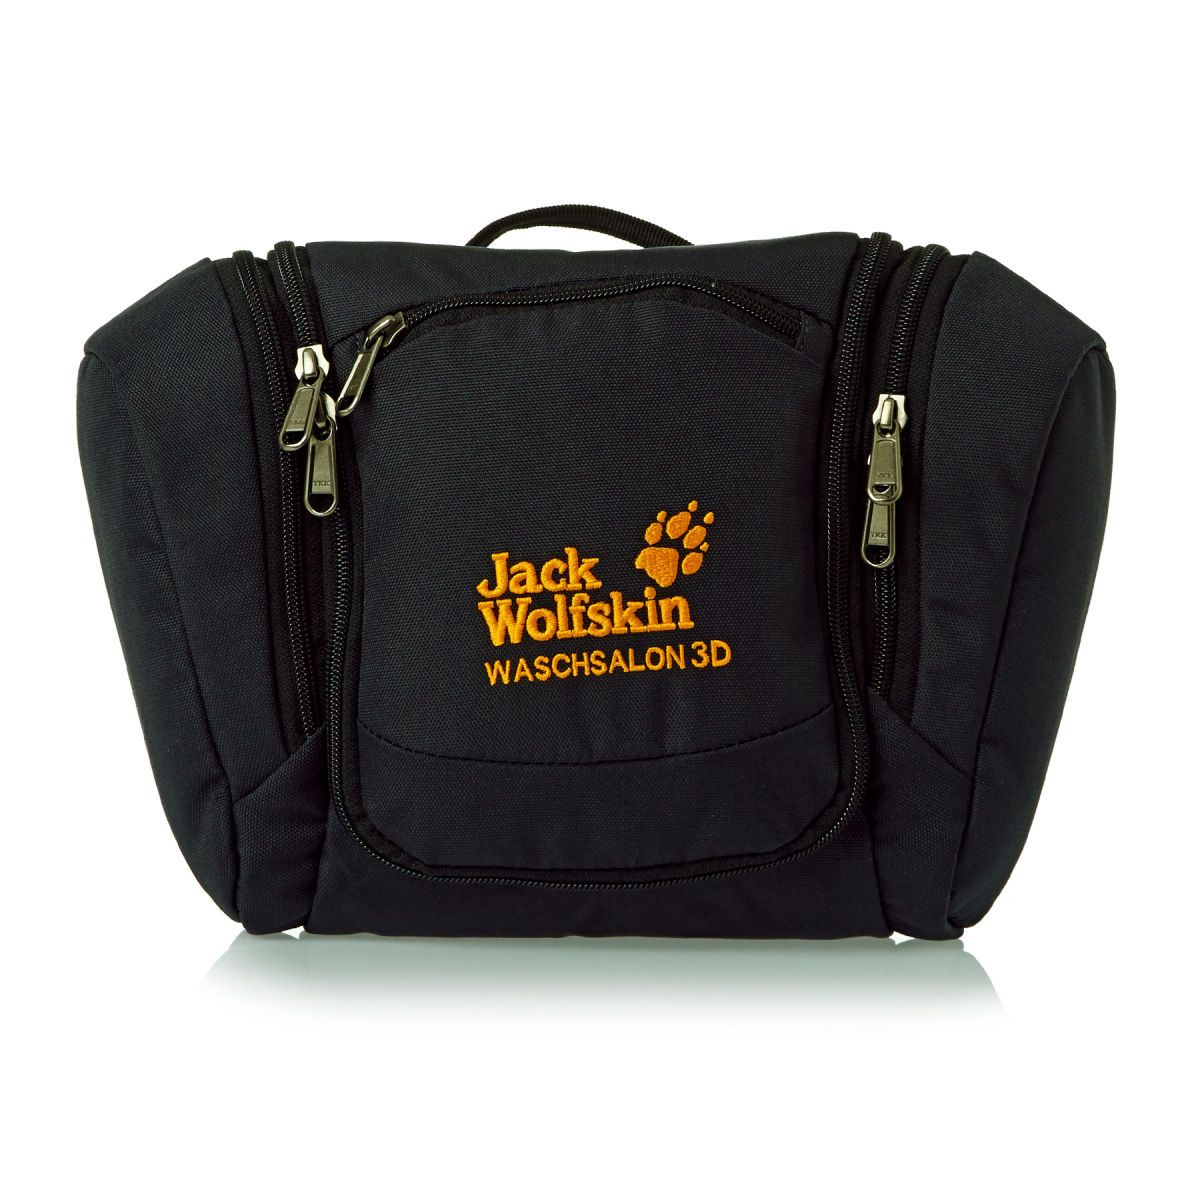 wash bag jack wolfskin